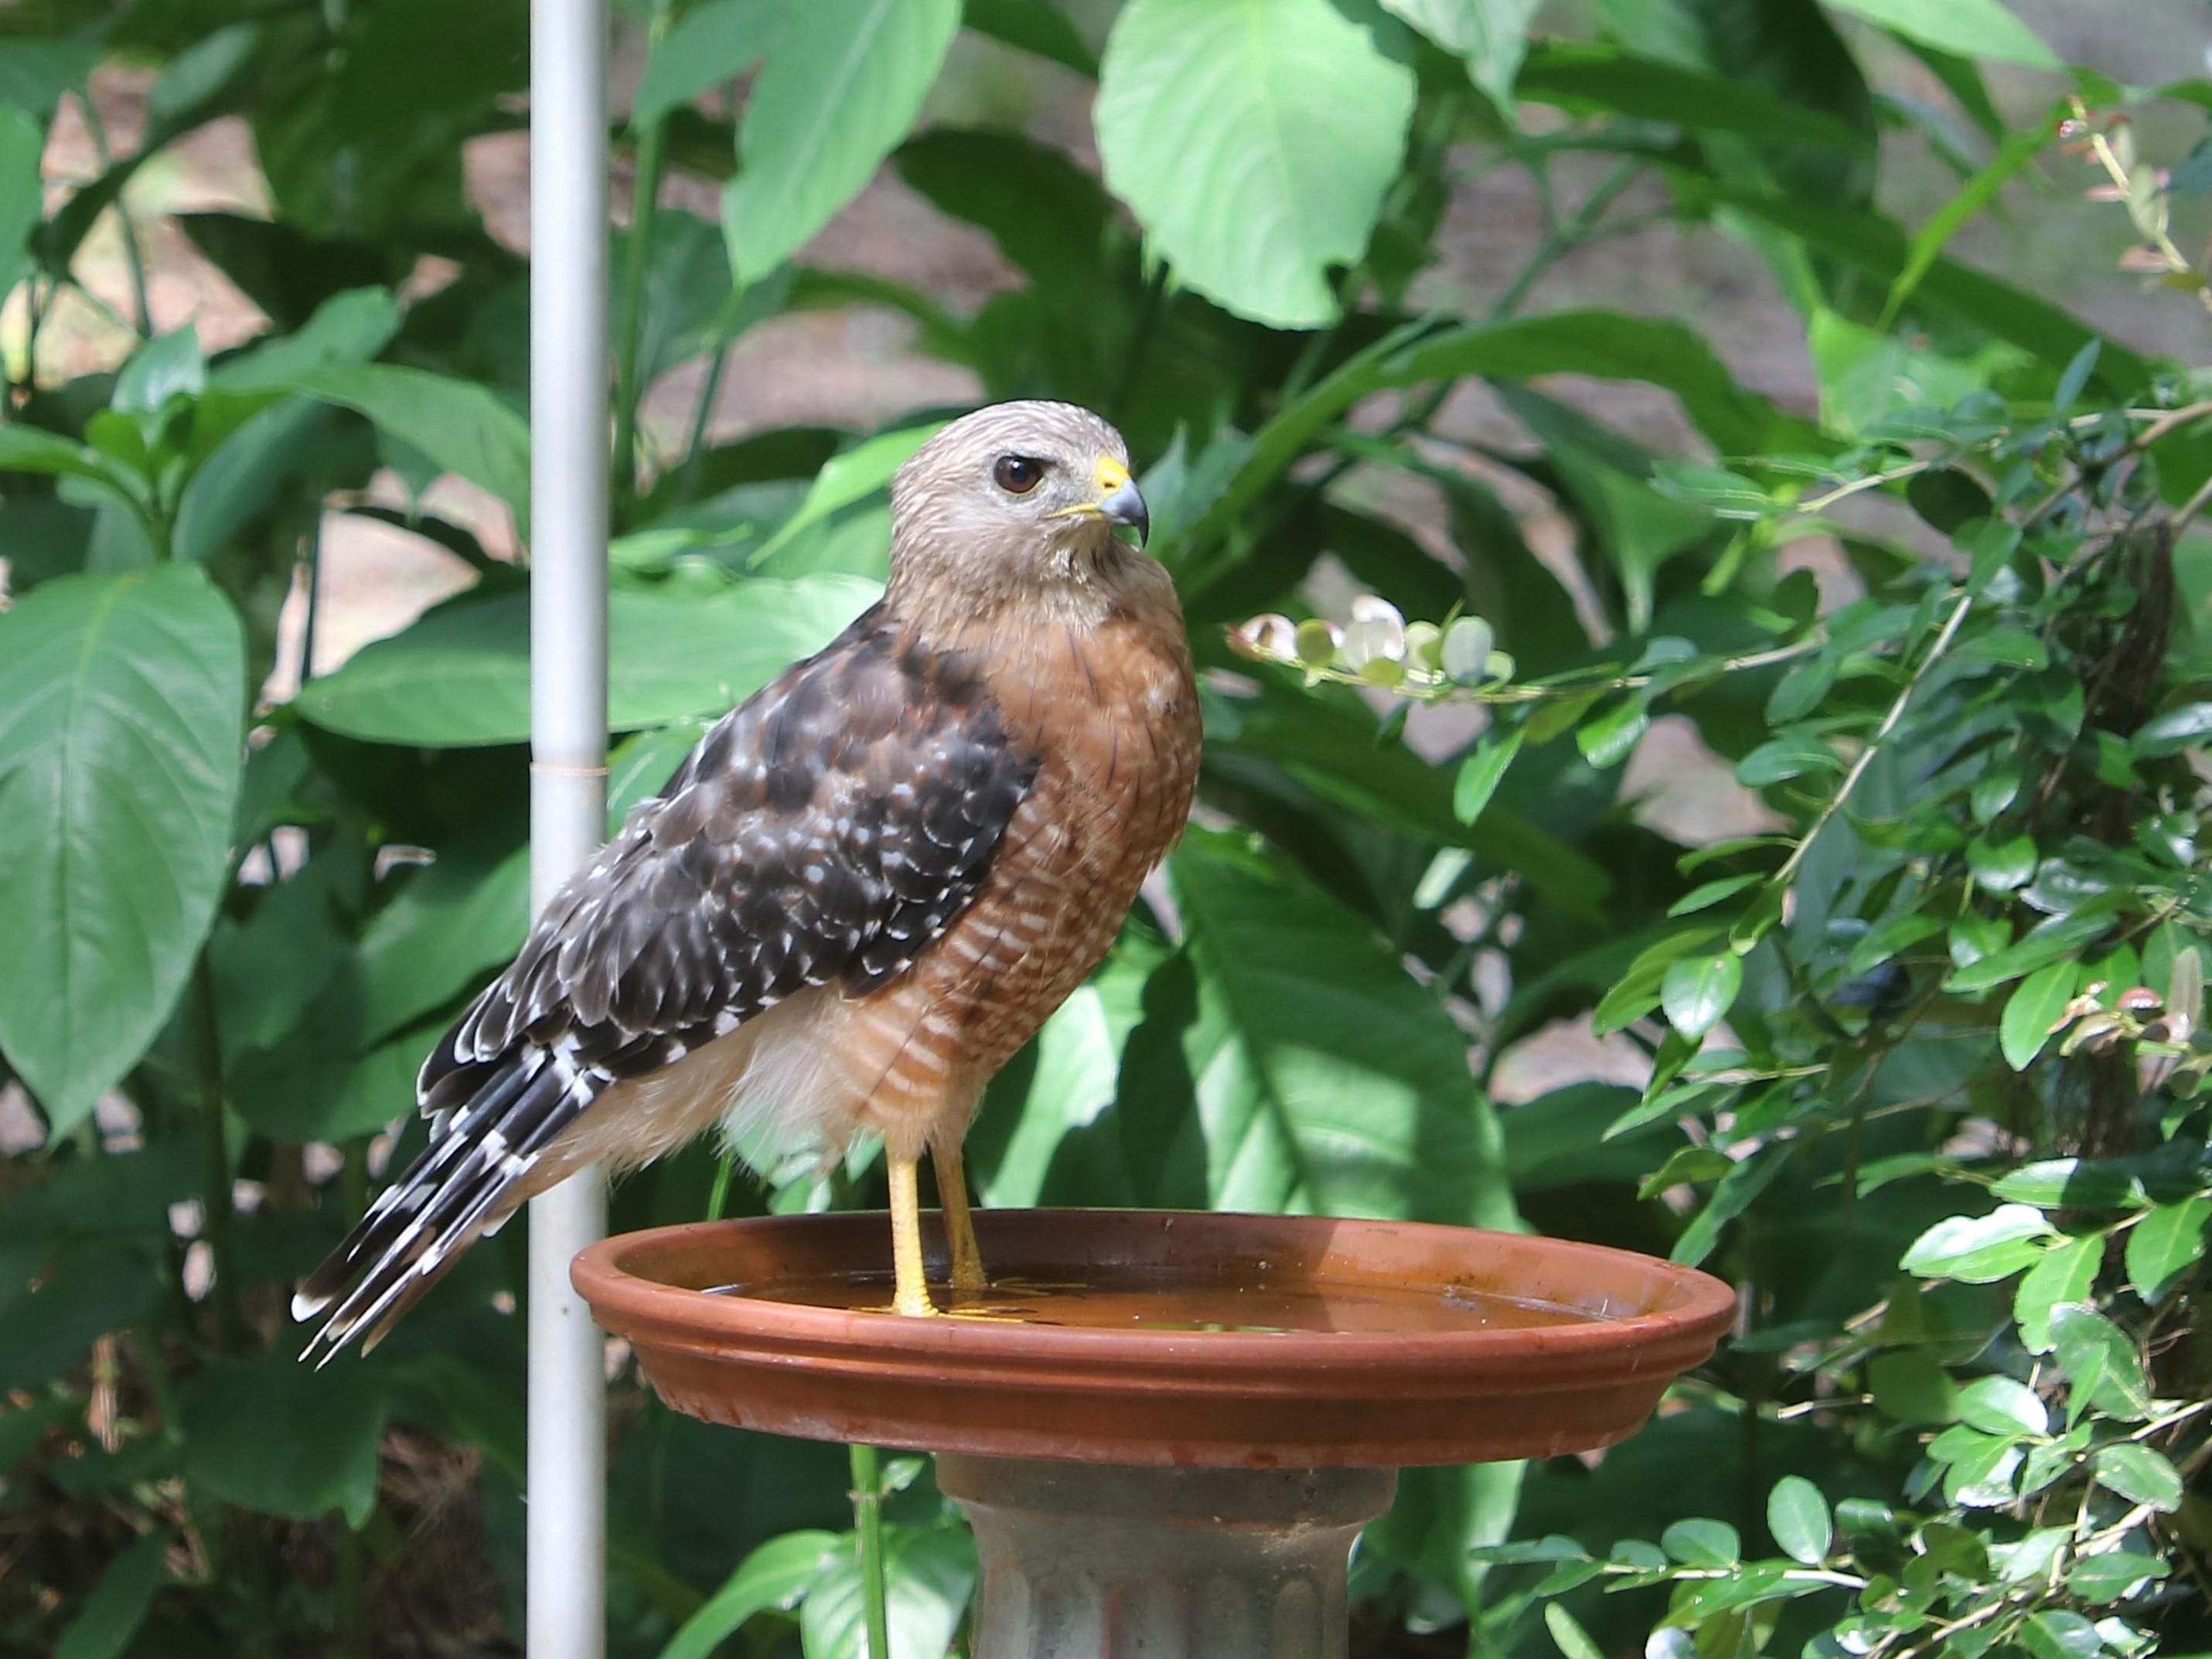 Getting your feet wet: Red-shouldered hawk standing in a birdbath